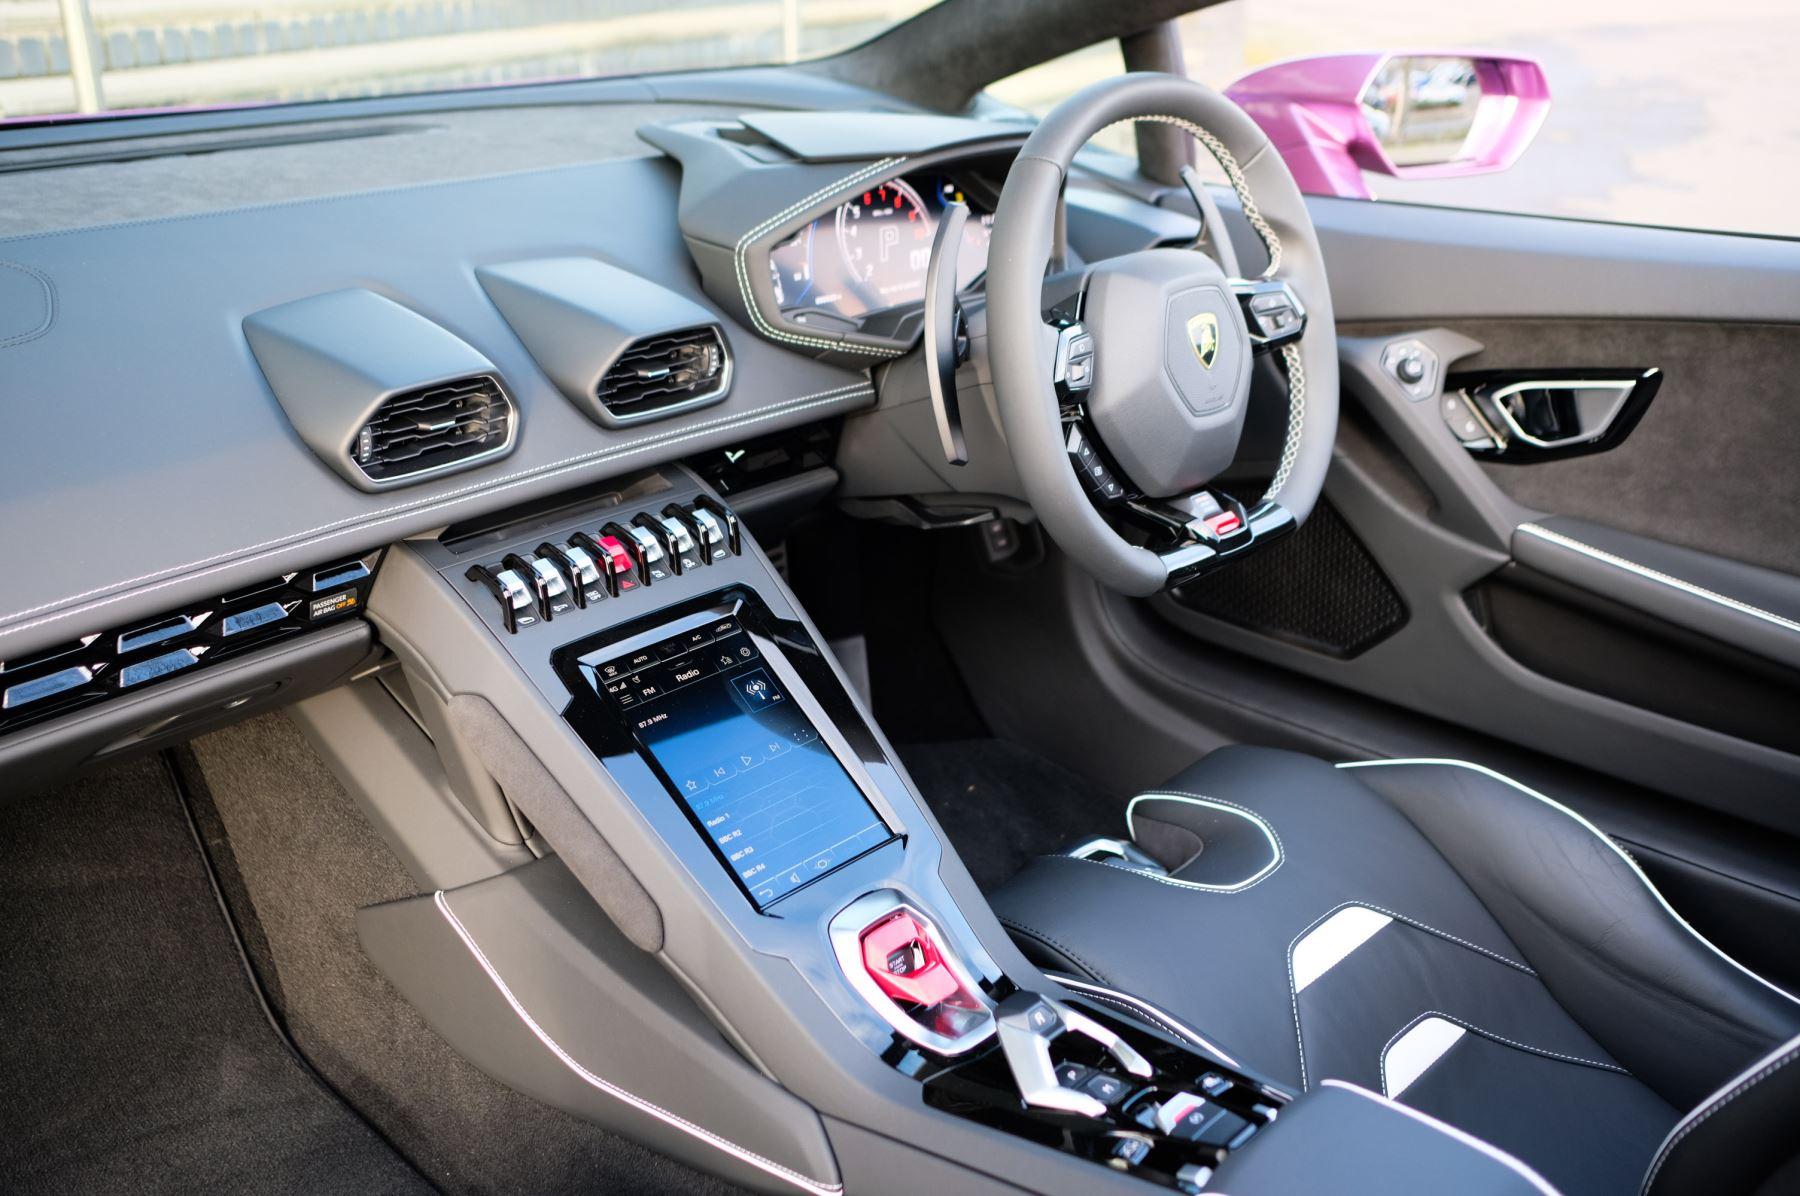 Lamborghini Huracan EVO Spyder 5.2 V10 640 2dr Auto AWD image 7